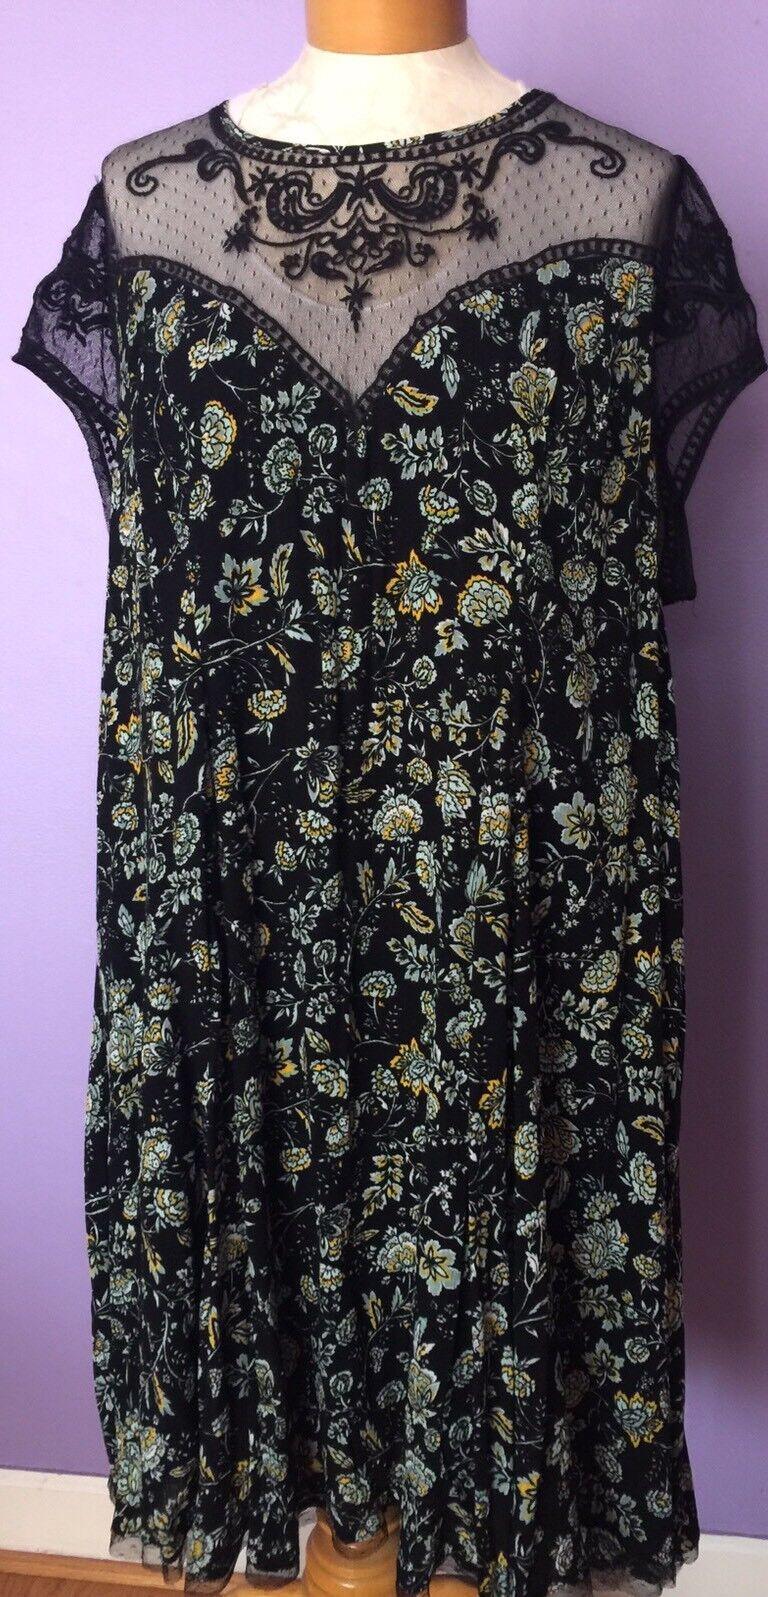 8d39cbab5 Torrid Gauze Mesh Mesh Mesh Insert Dress Floral 5b4b79 - dressstore ...